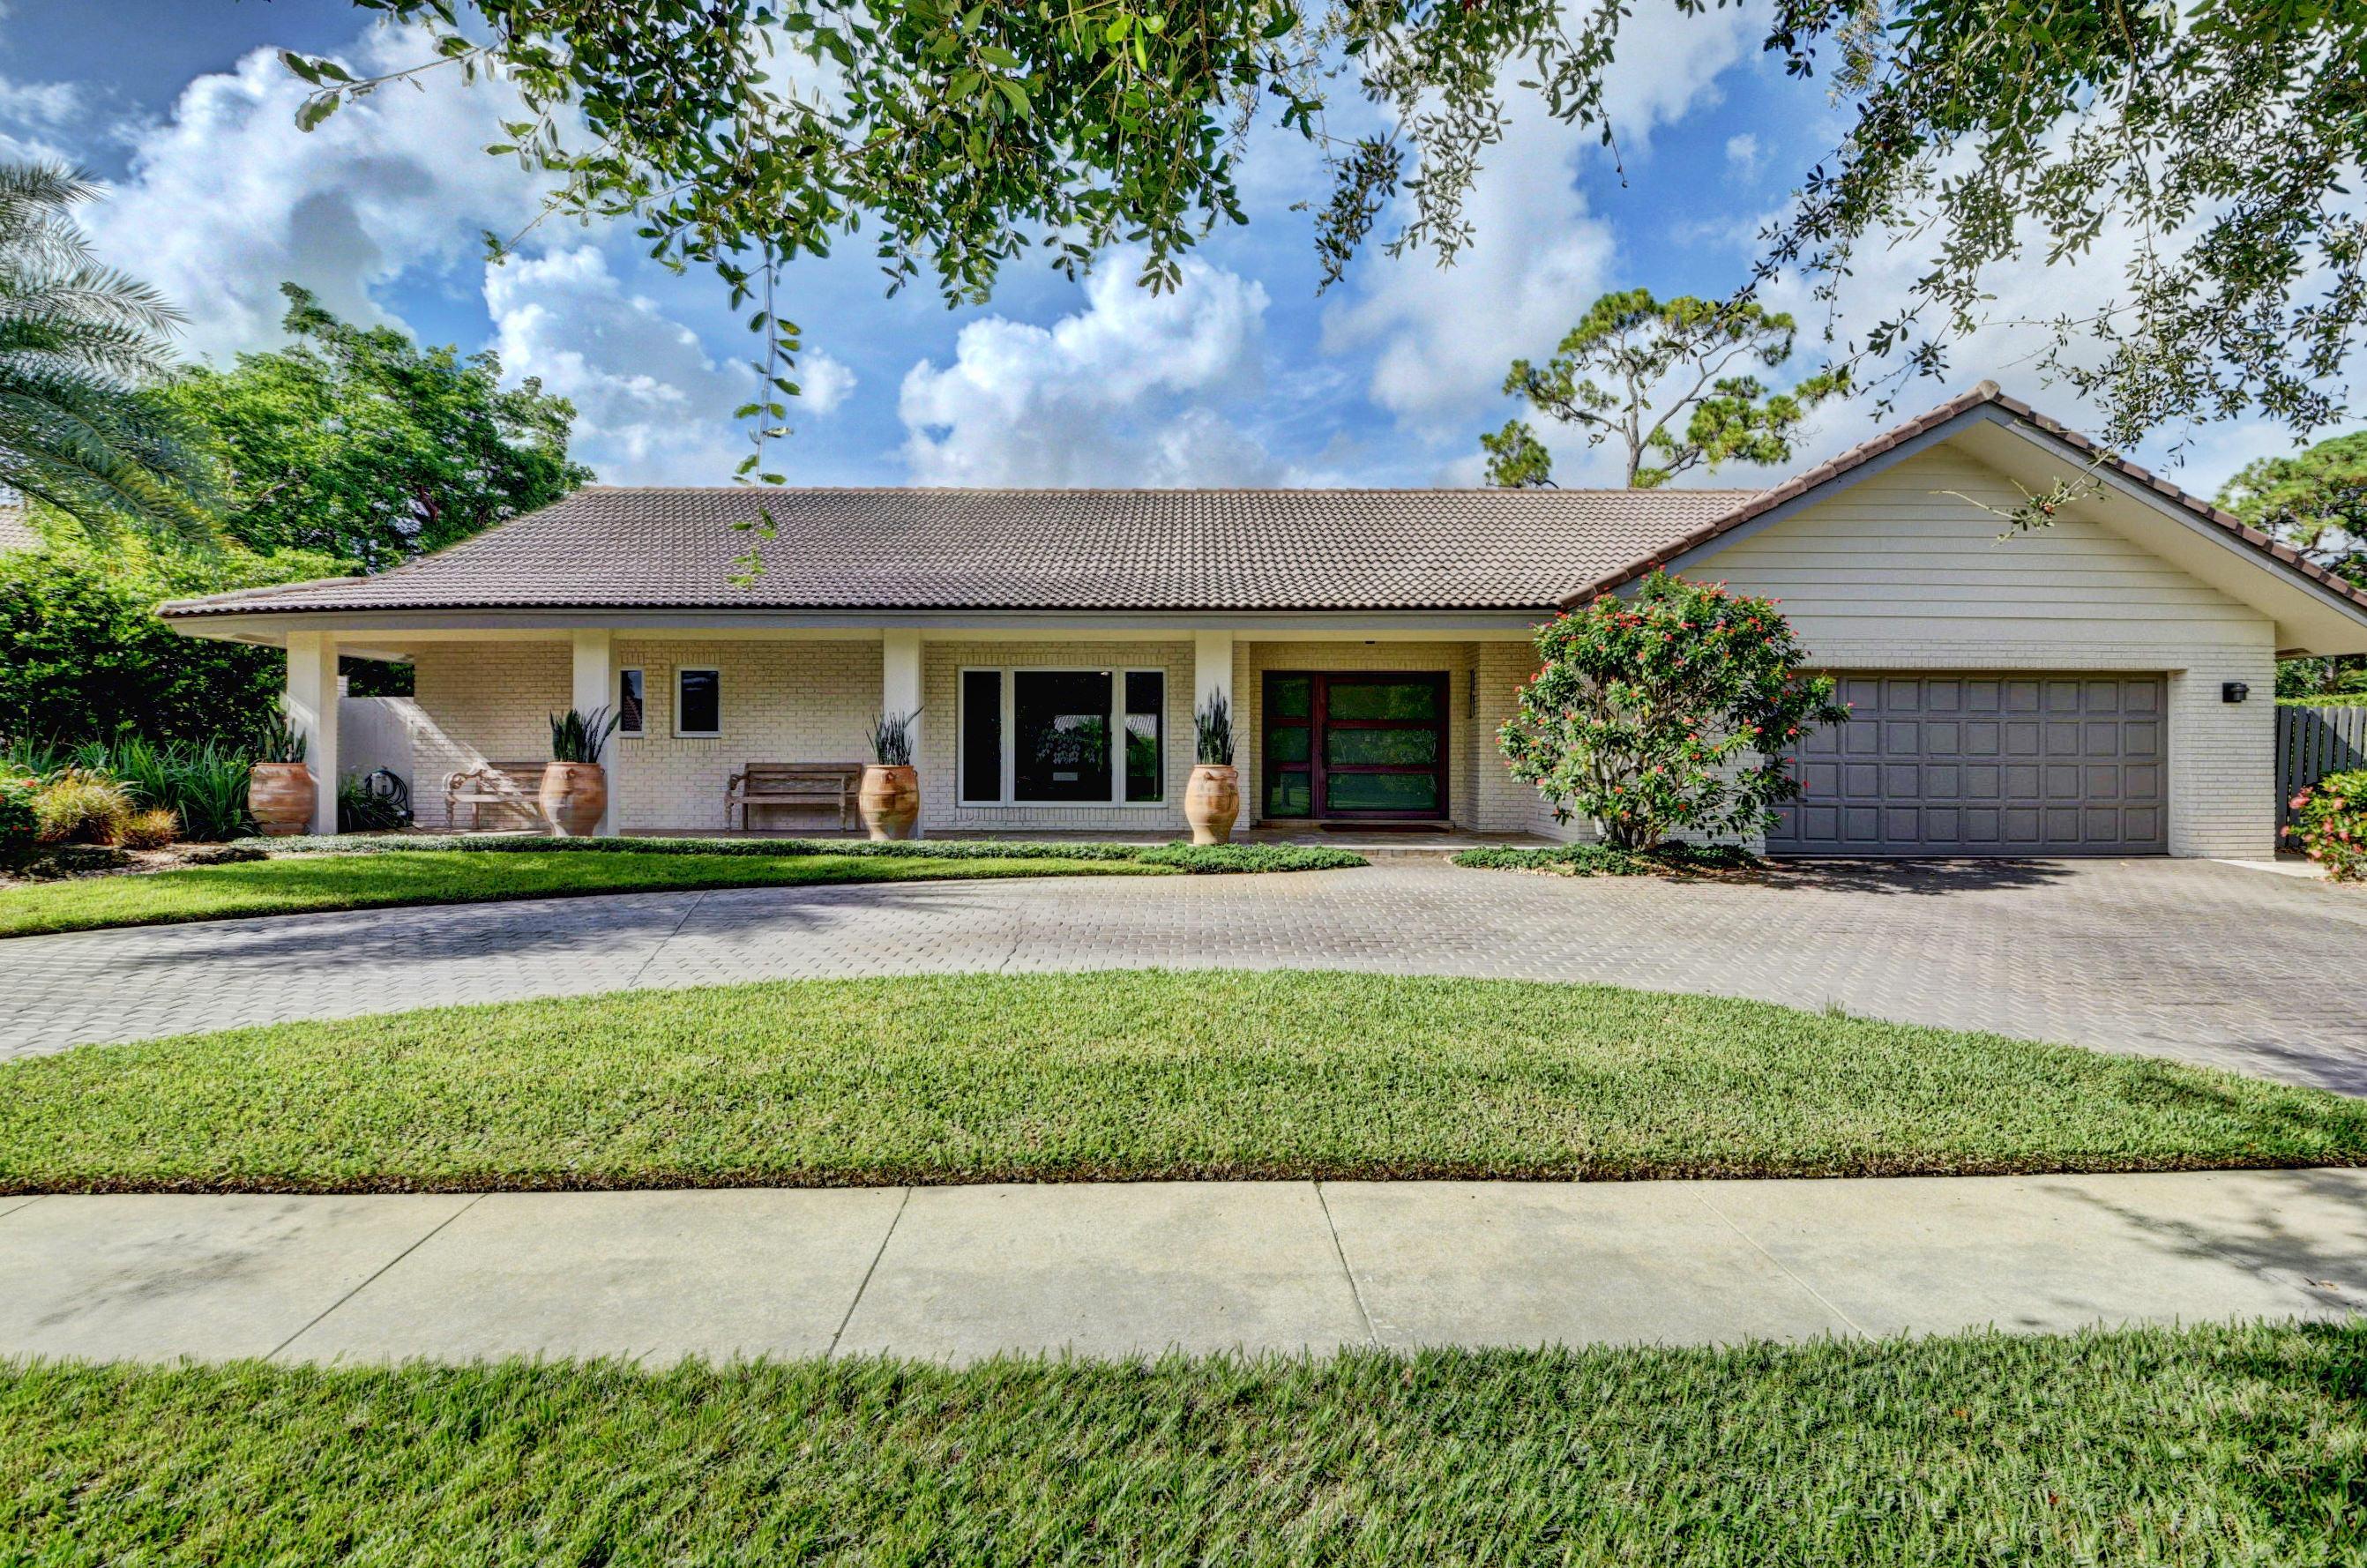 7624 Marbella Terrace Boca Raton, FL 33433